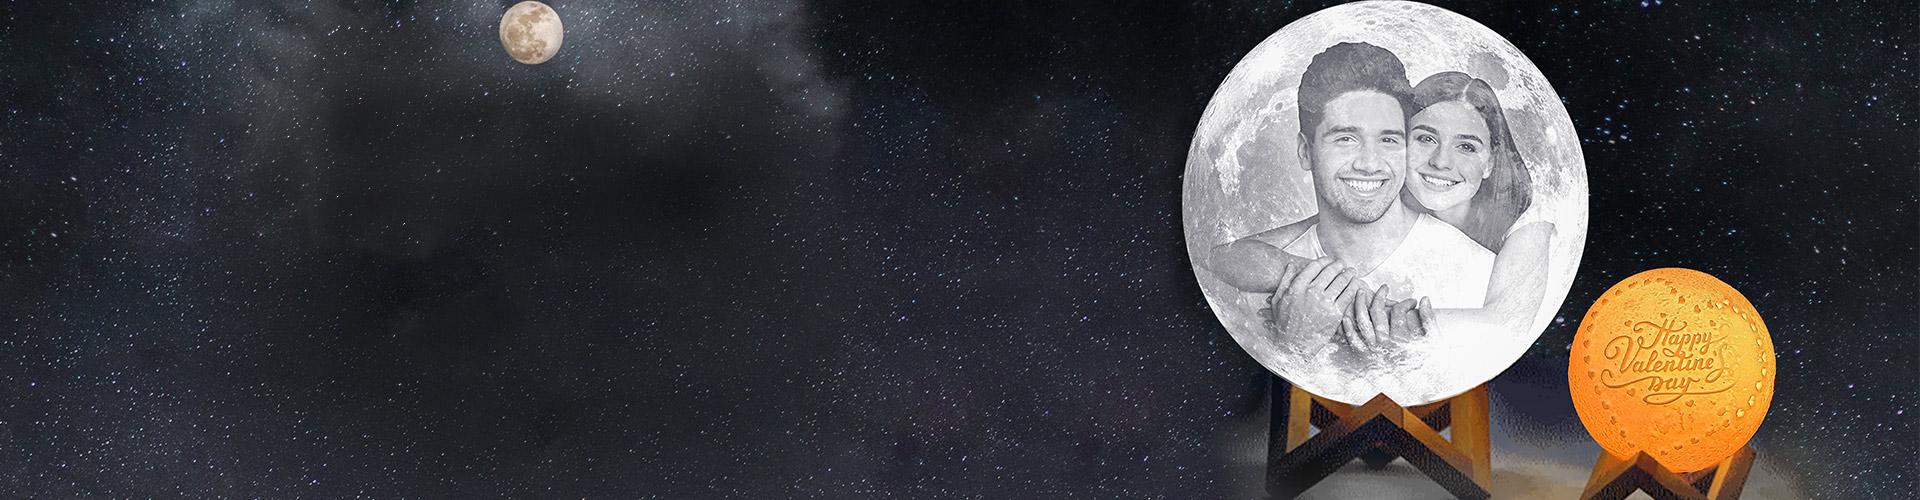 Personalised Moon Lamp